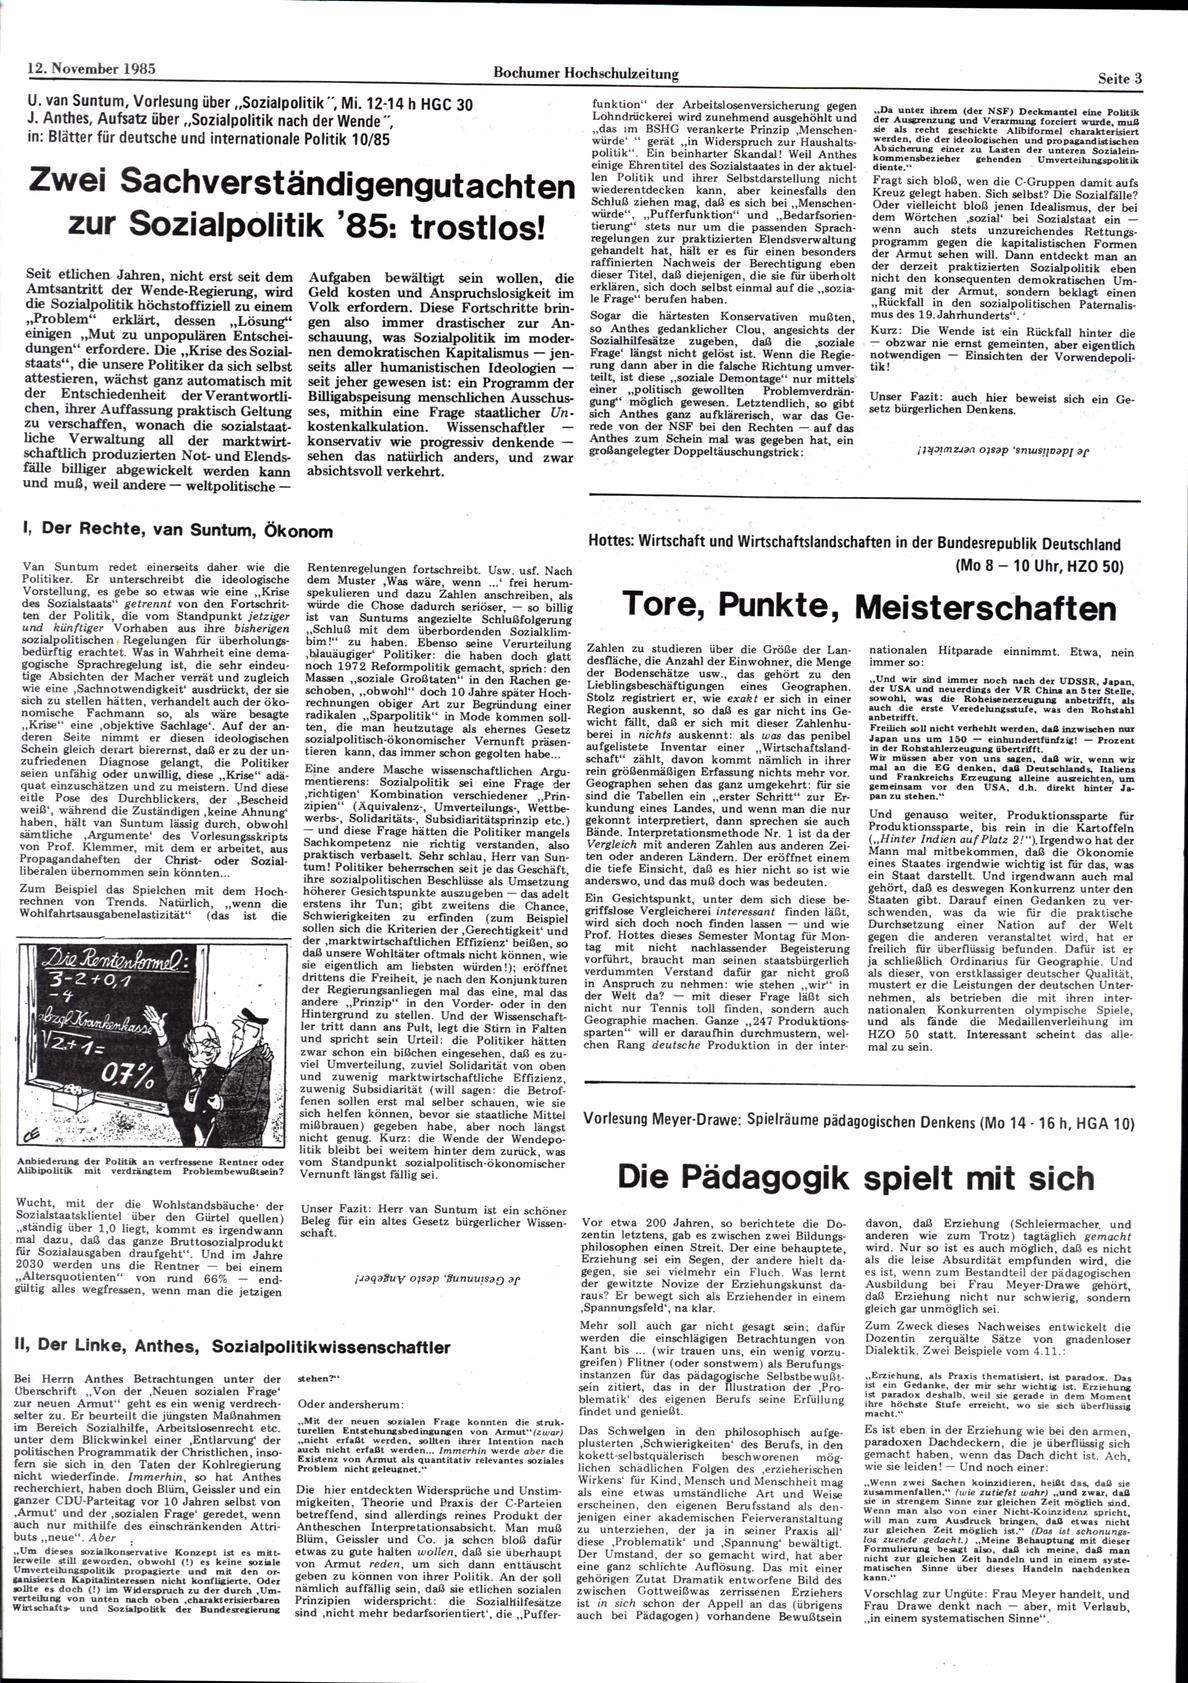 Bochum_BHZ_19851112_118_003